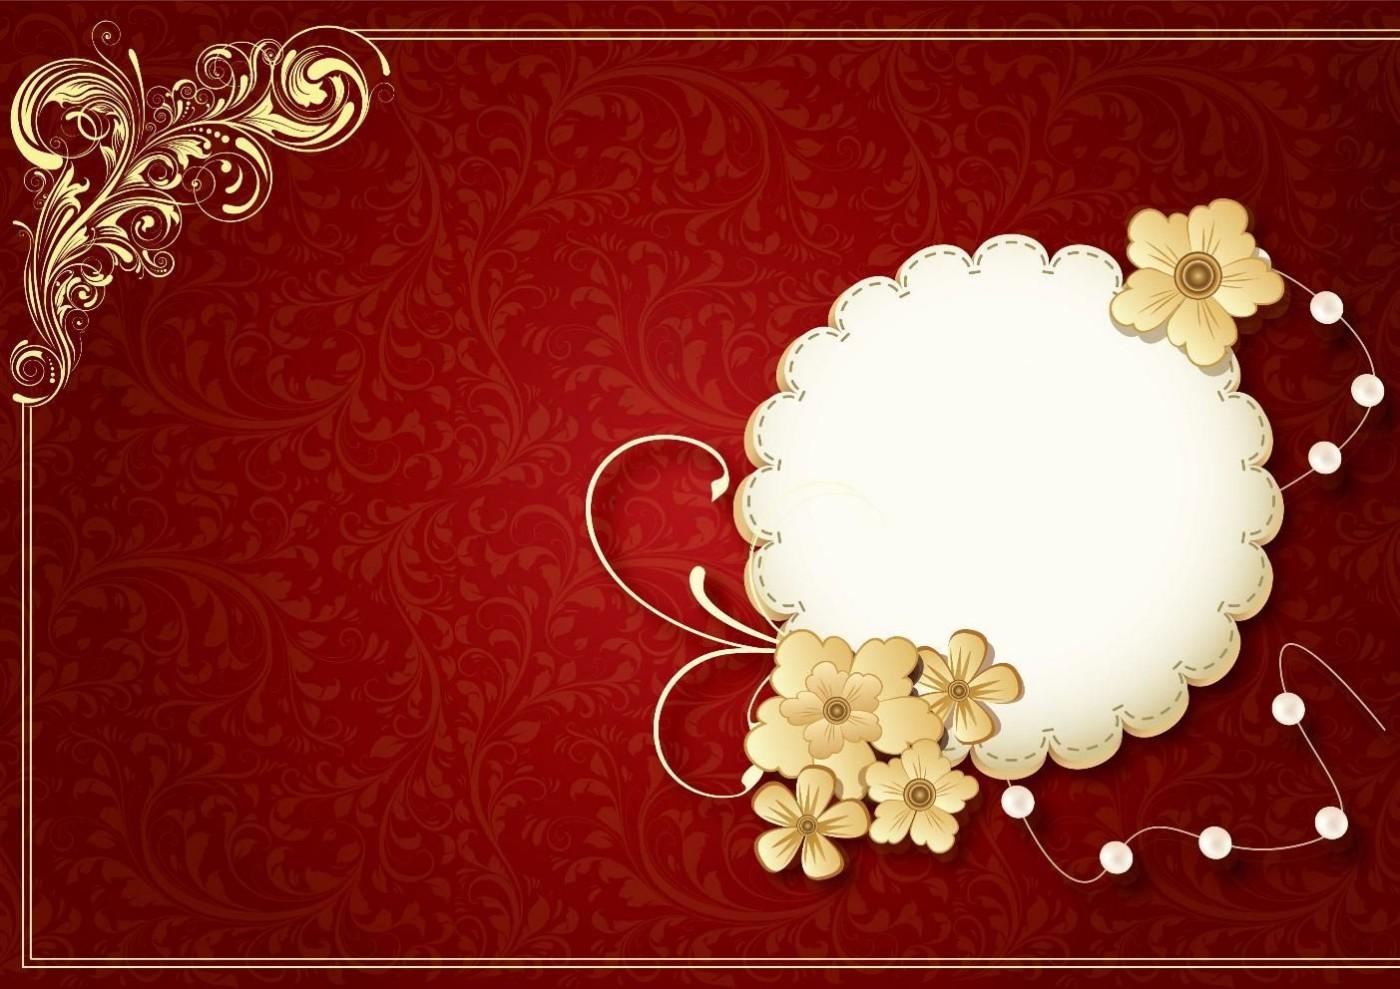 007 Stunning Free Online Indian Wedding Invitation Card Template High Def 1400